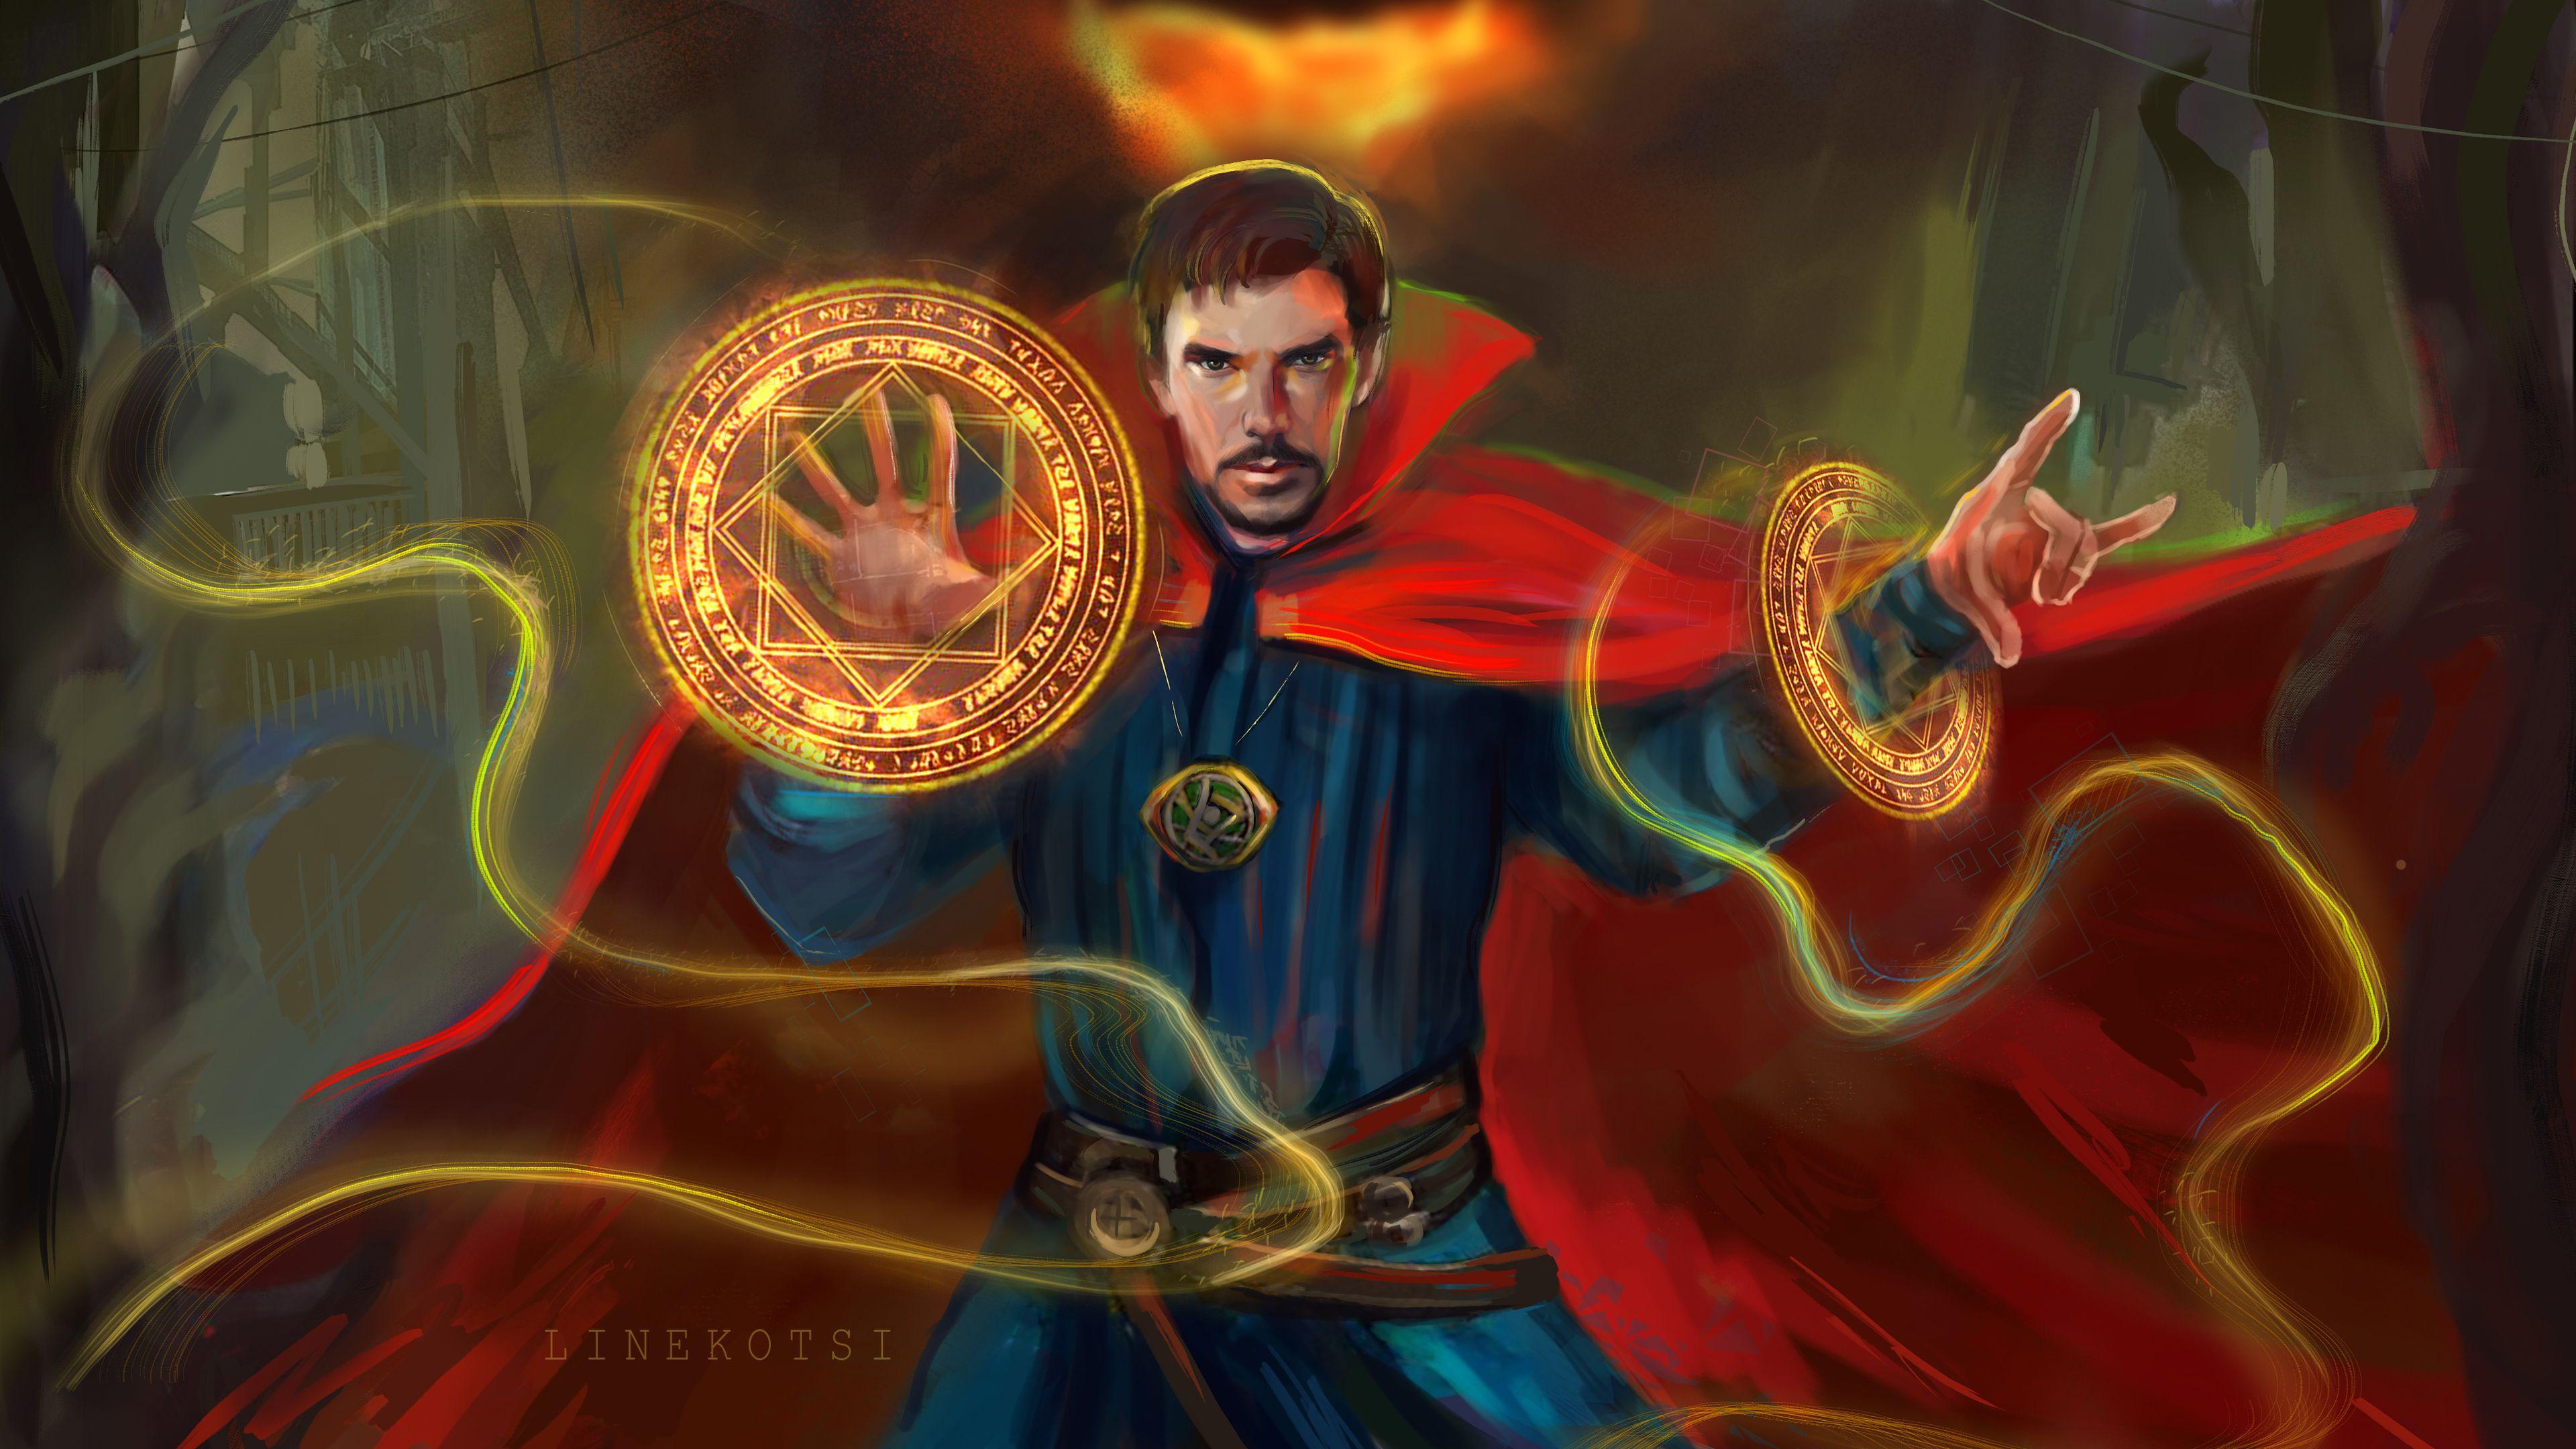 Arts Doctor Strange 4k superheroes wallpapers, hd